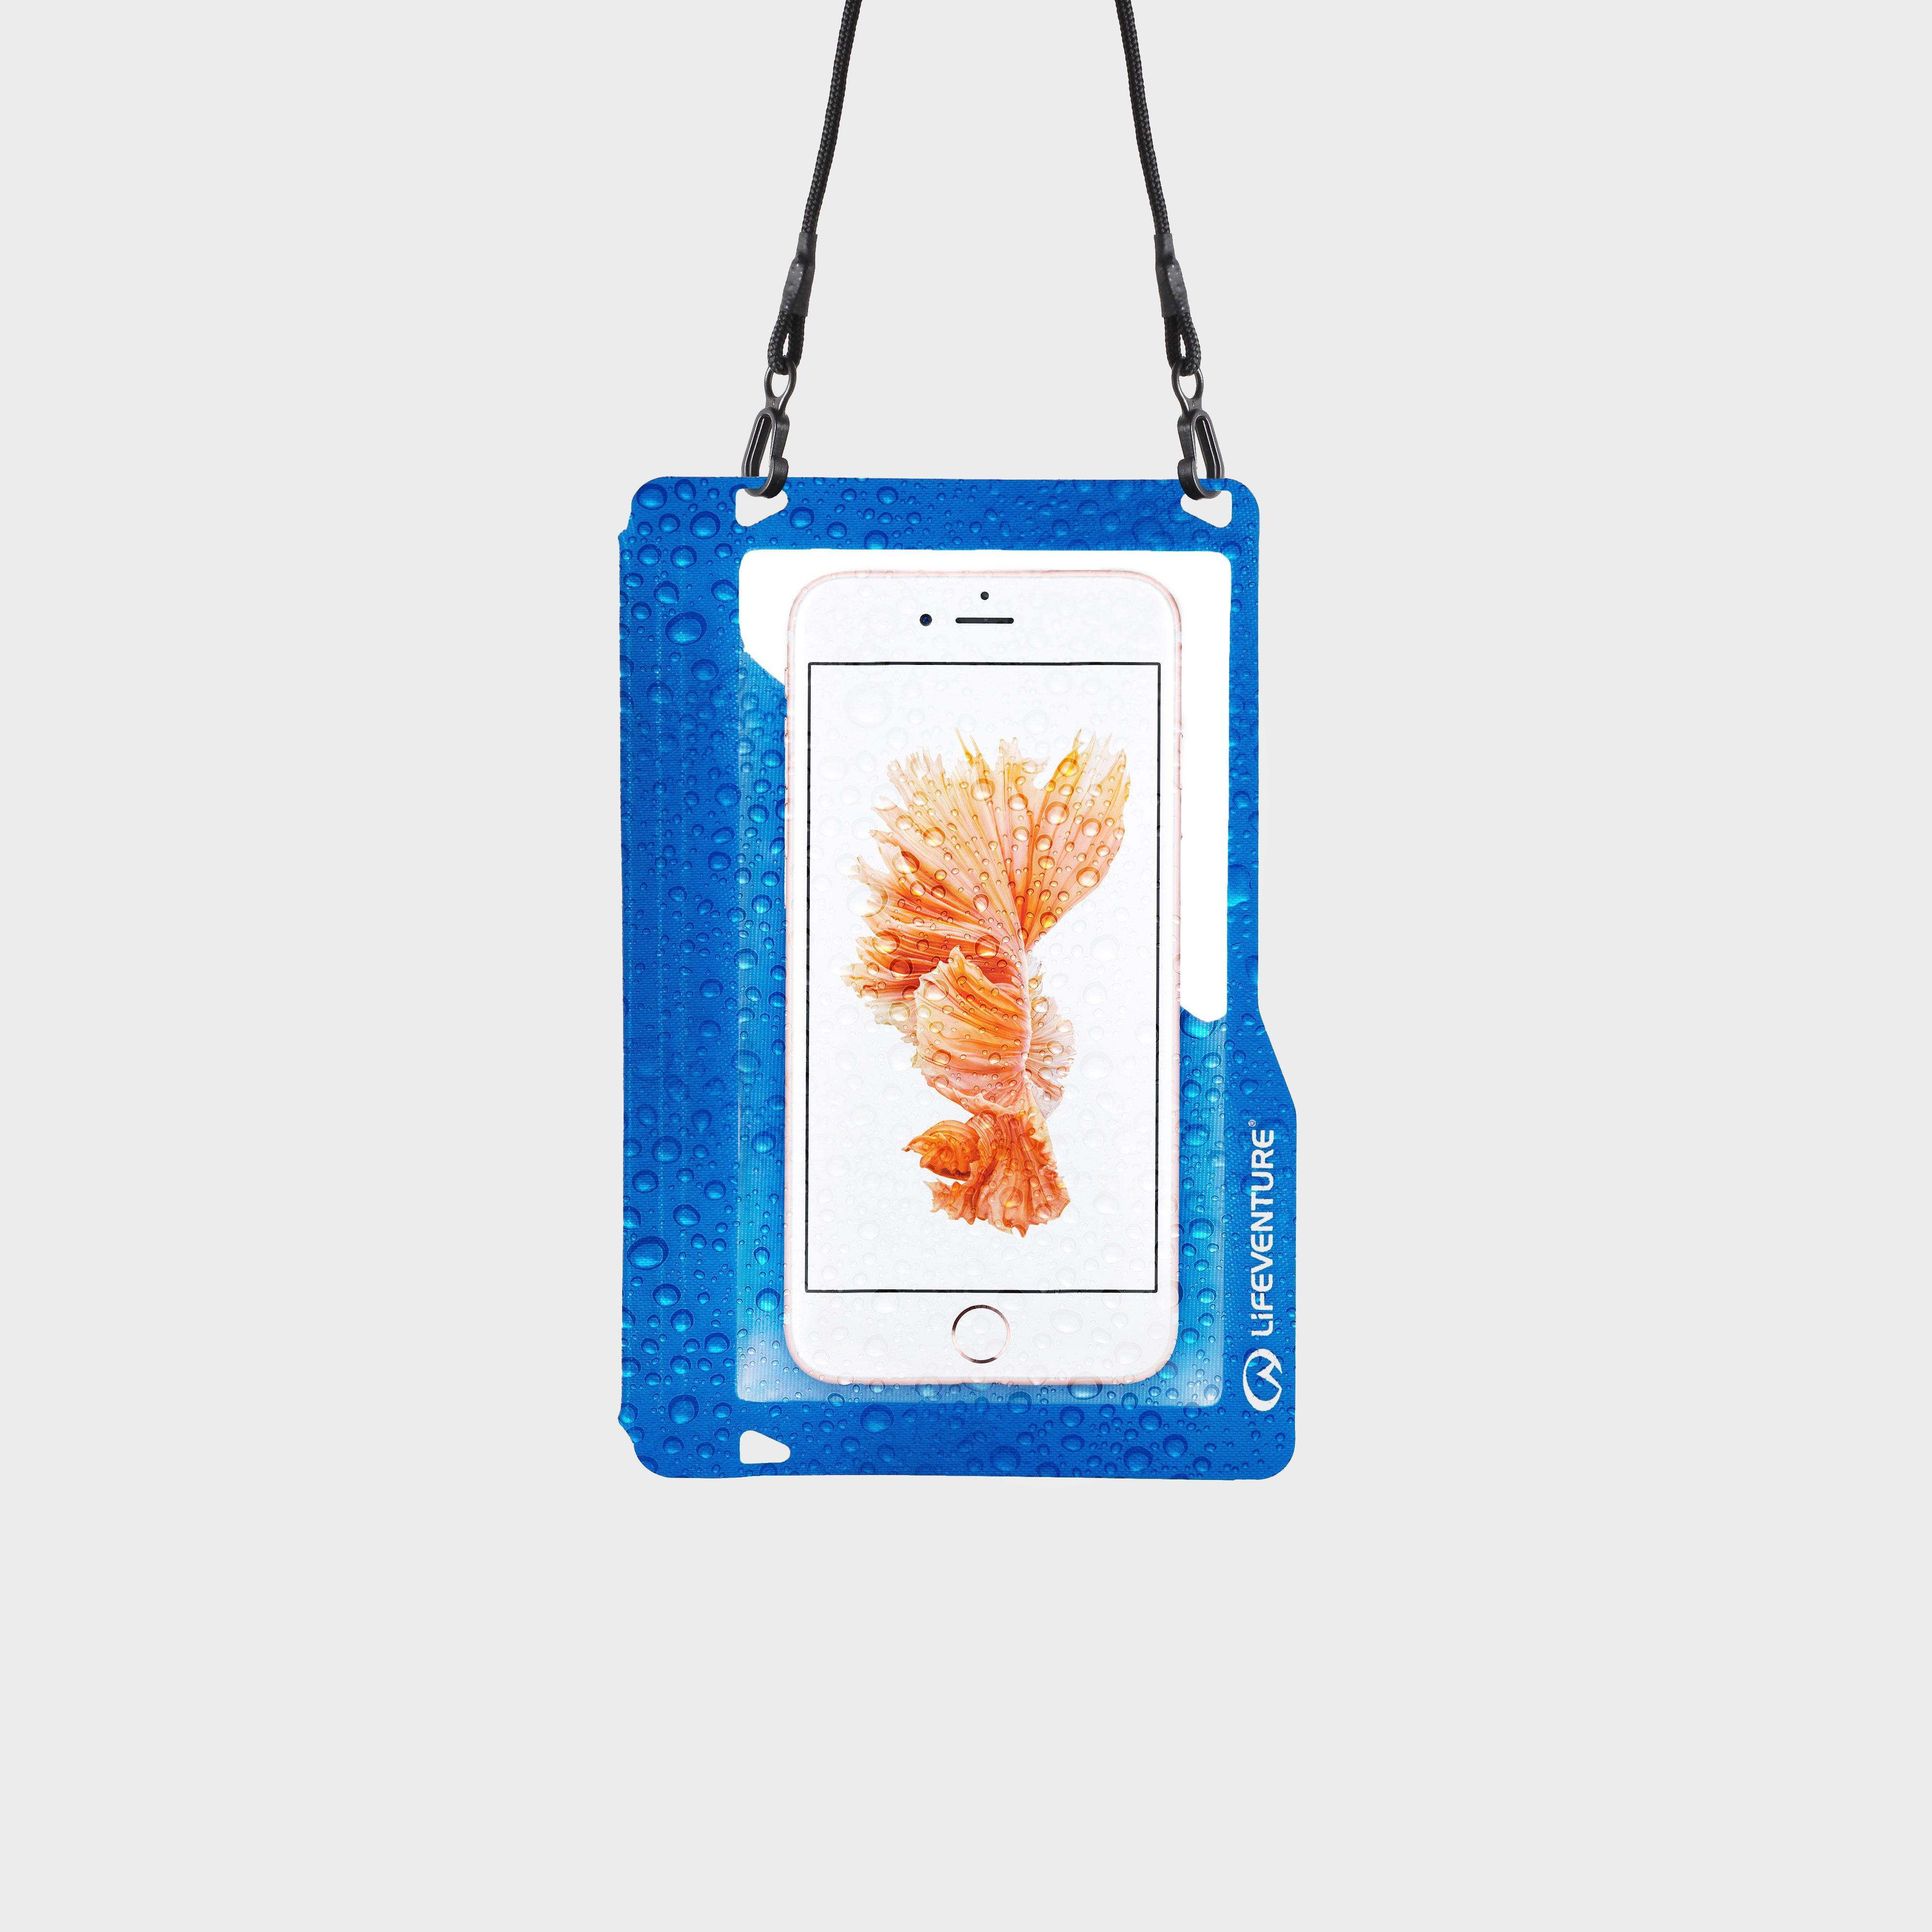 Lifeventure Lifeventure Hydroseal Phone Case Plus - Blue, Blue